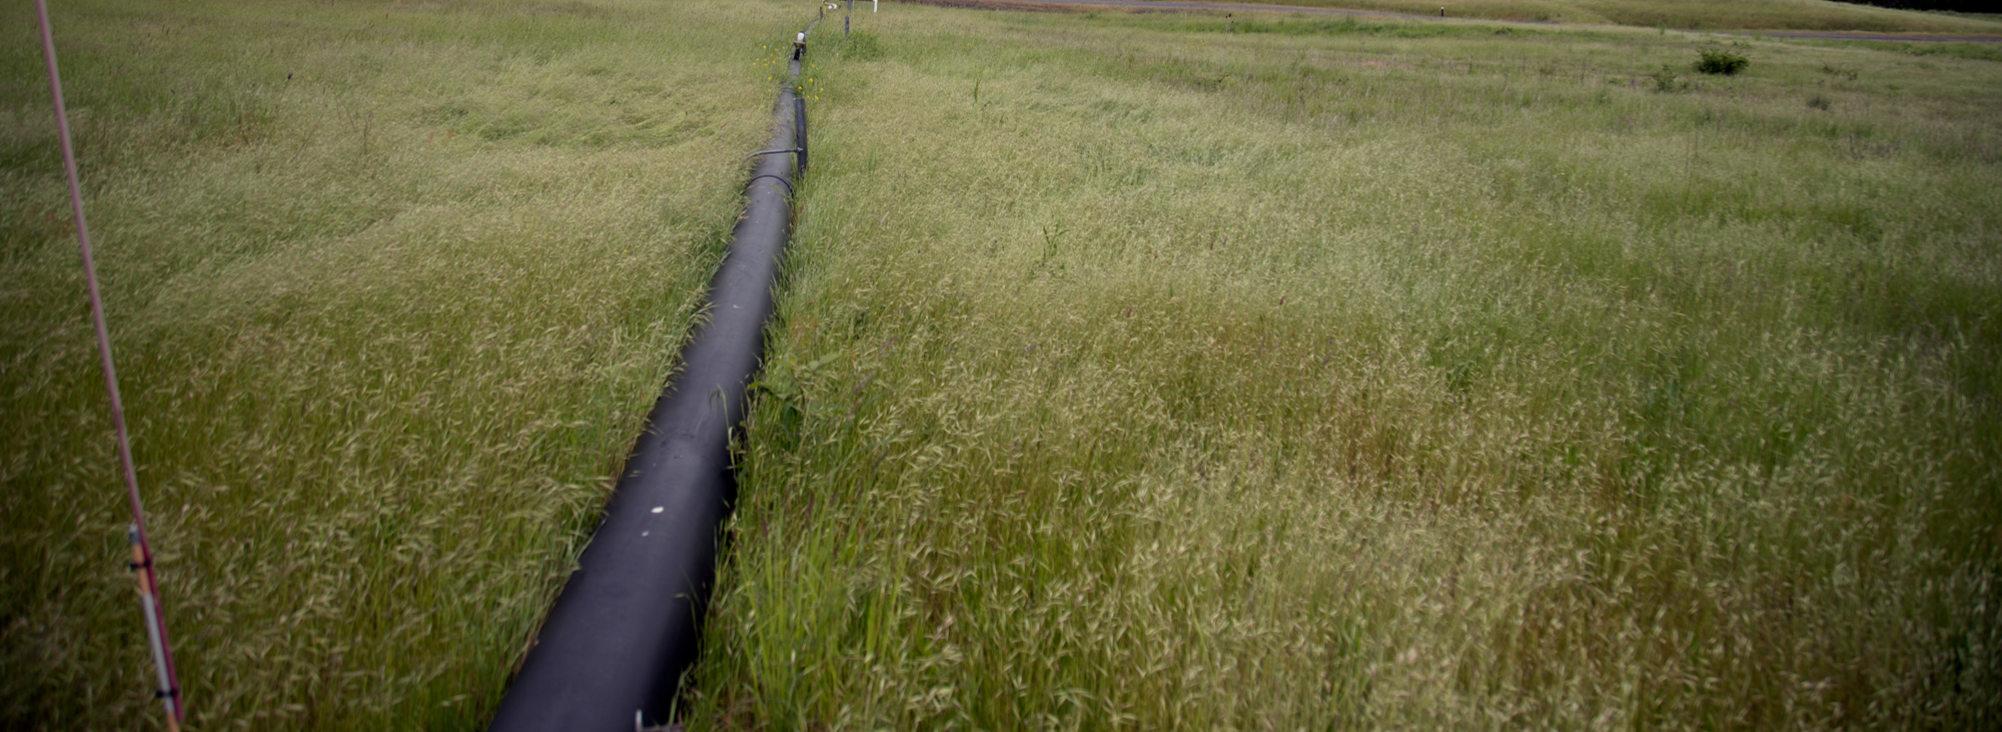 pipe at St. Johns prairie